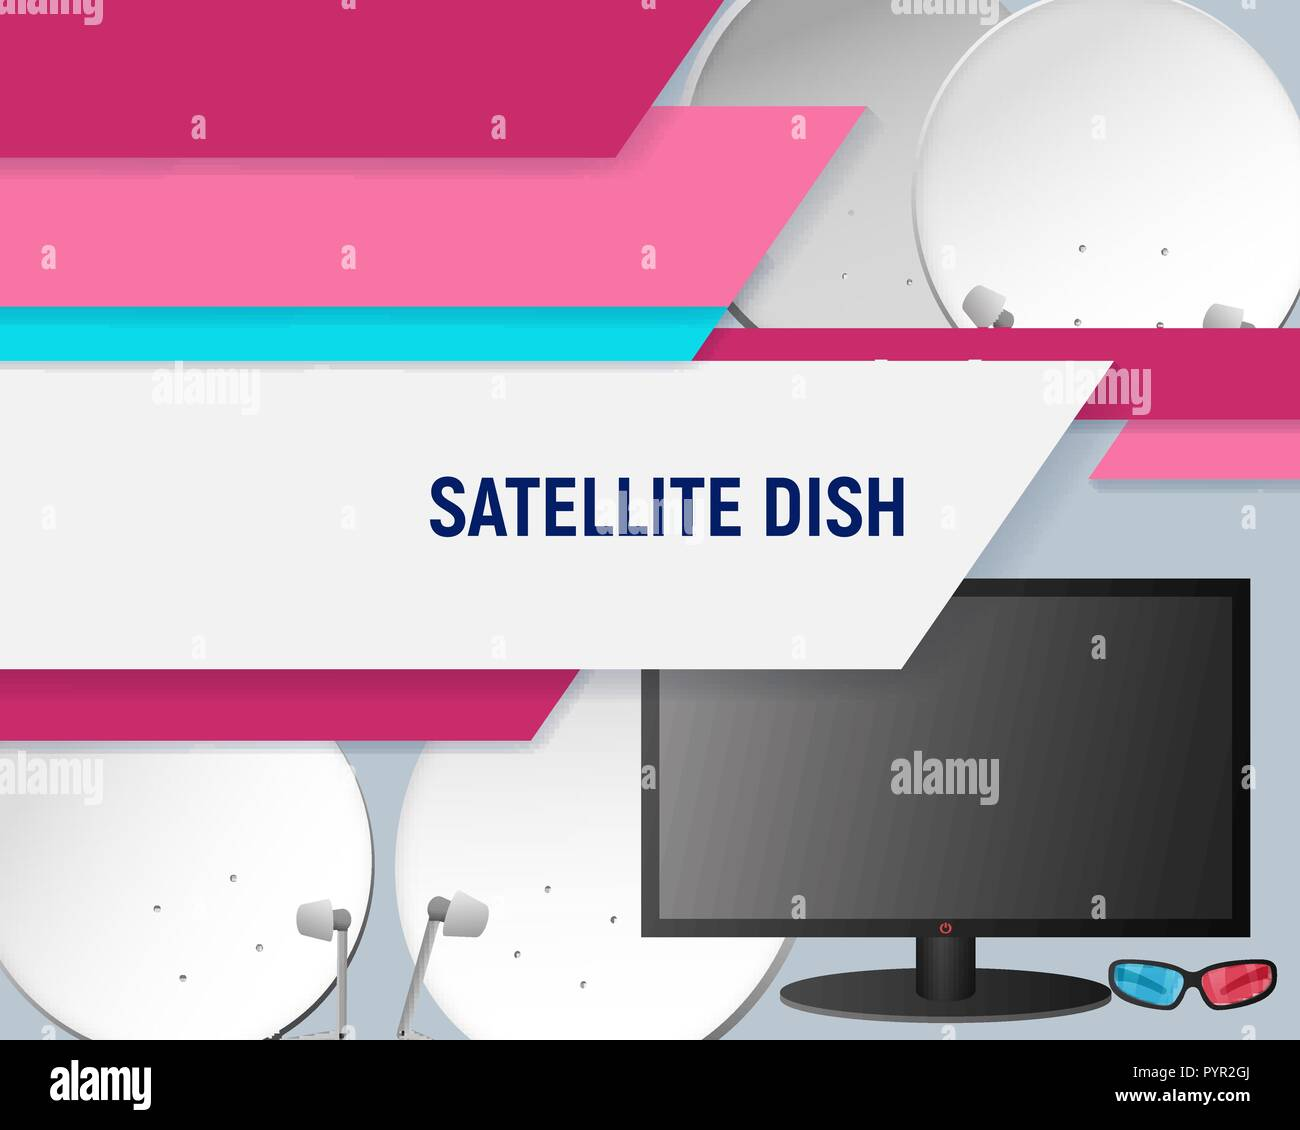 Television aerial design template. Satellite television dish vector illustration. - Stock Image